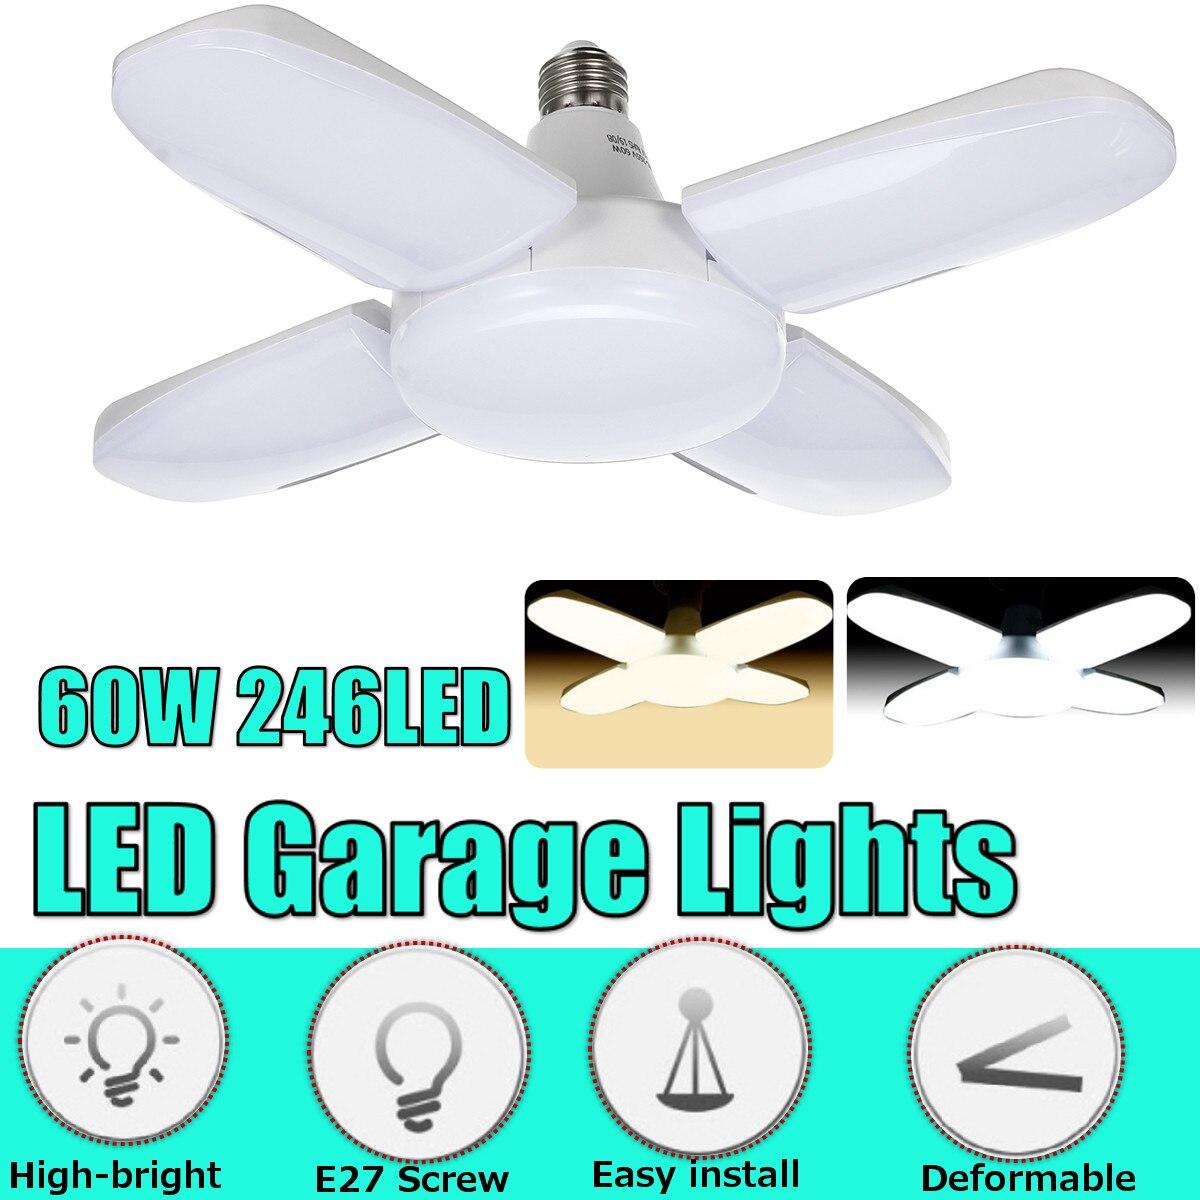 E27 LED Bulb Foldable Fan Blade Bulb  60W 246pcs LED Lamp Super Bright White 6500K For Indoor Home Ceiling Light